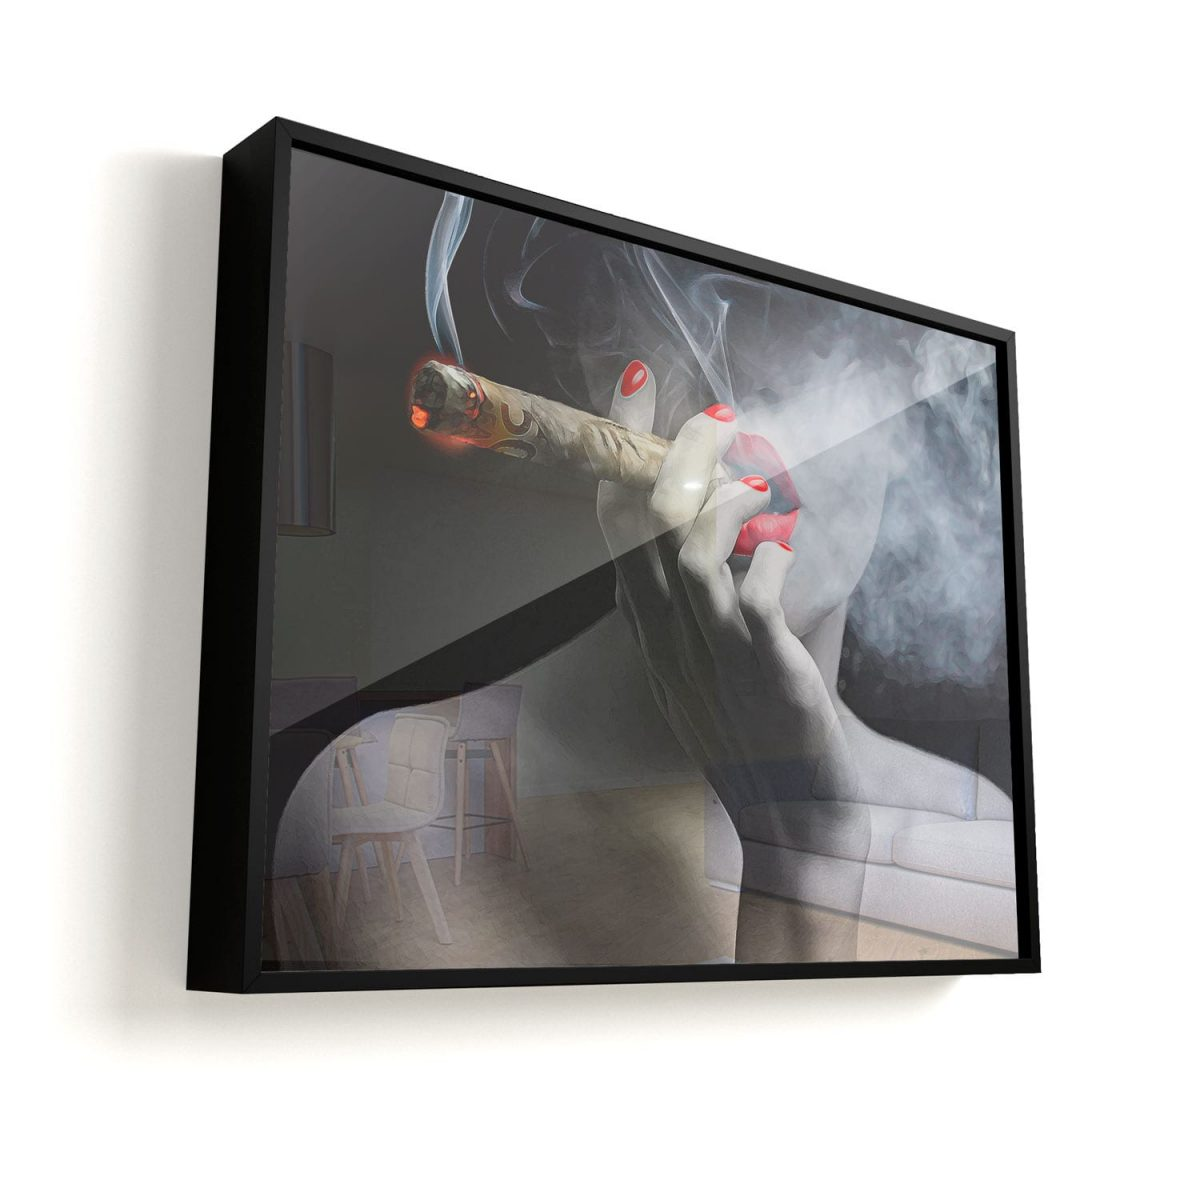 Quadro 50 Notas de Fumaça ao Som de Marilyn Monroe vidro